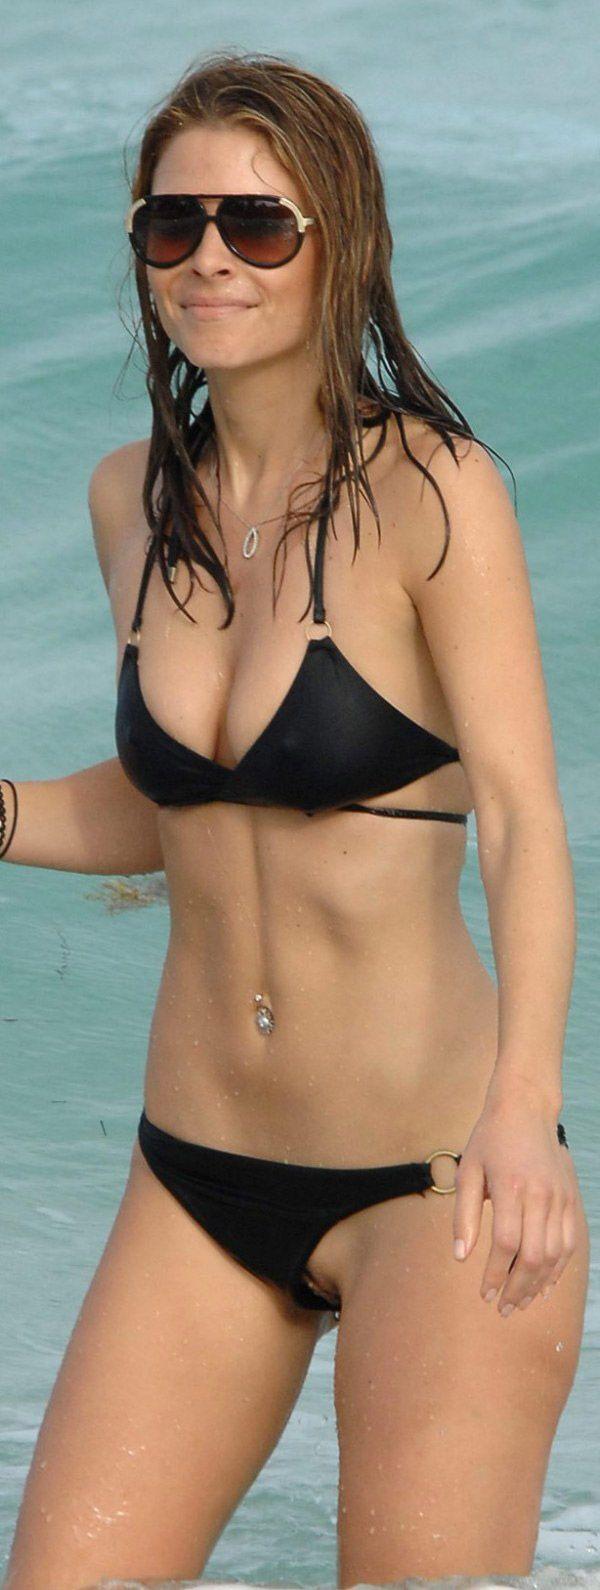 Maria Menounos Naked - Hledat Googlem  Maria Menounos -1477